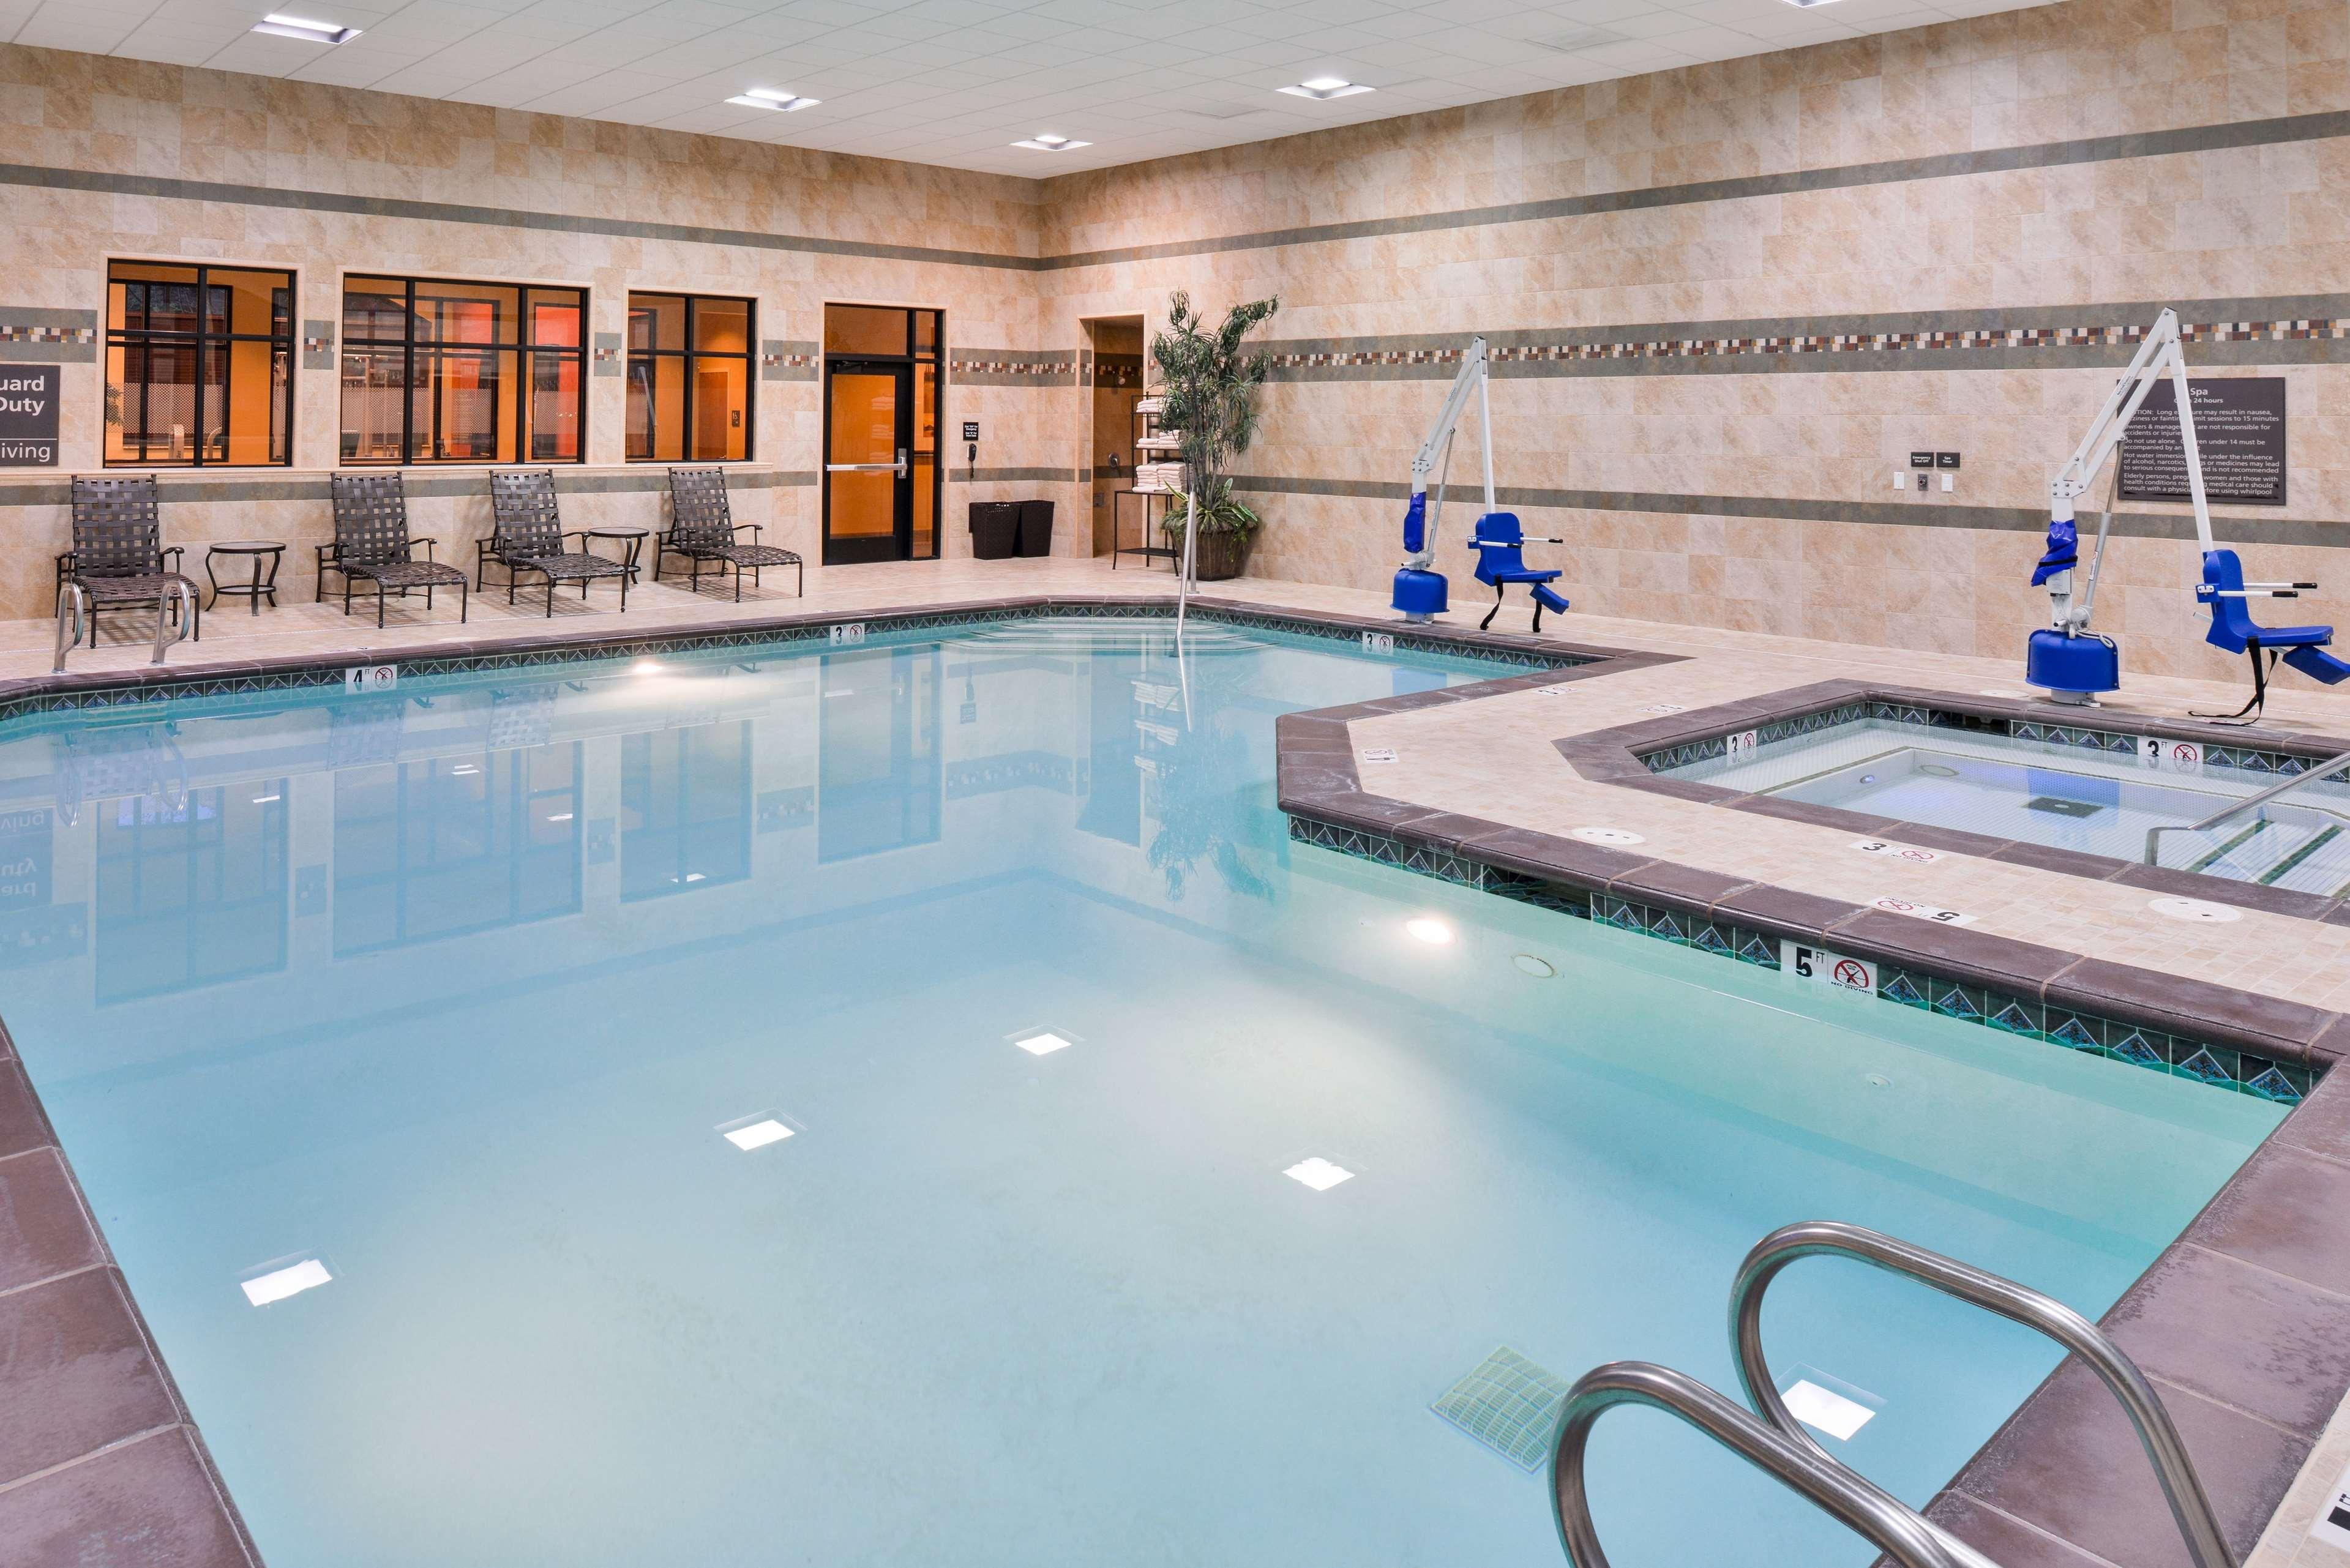 Hampton Inn & Suites Coeur d' Alene image 7